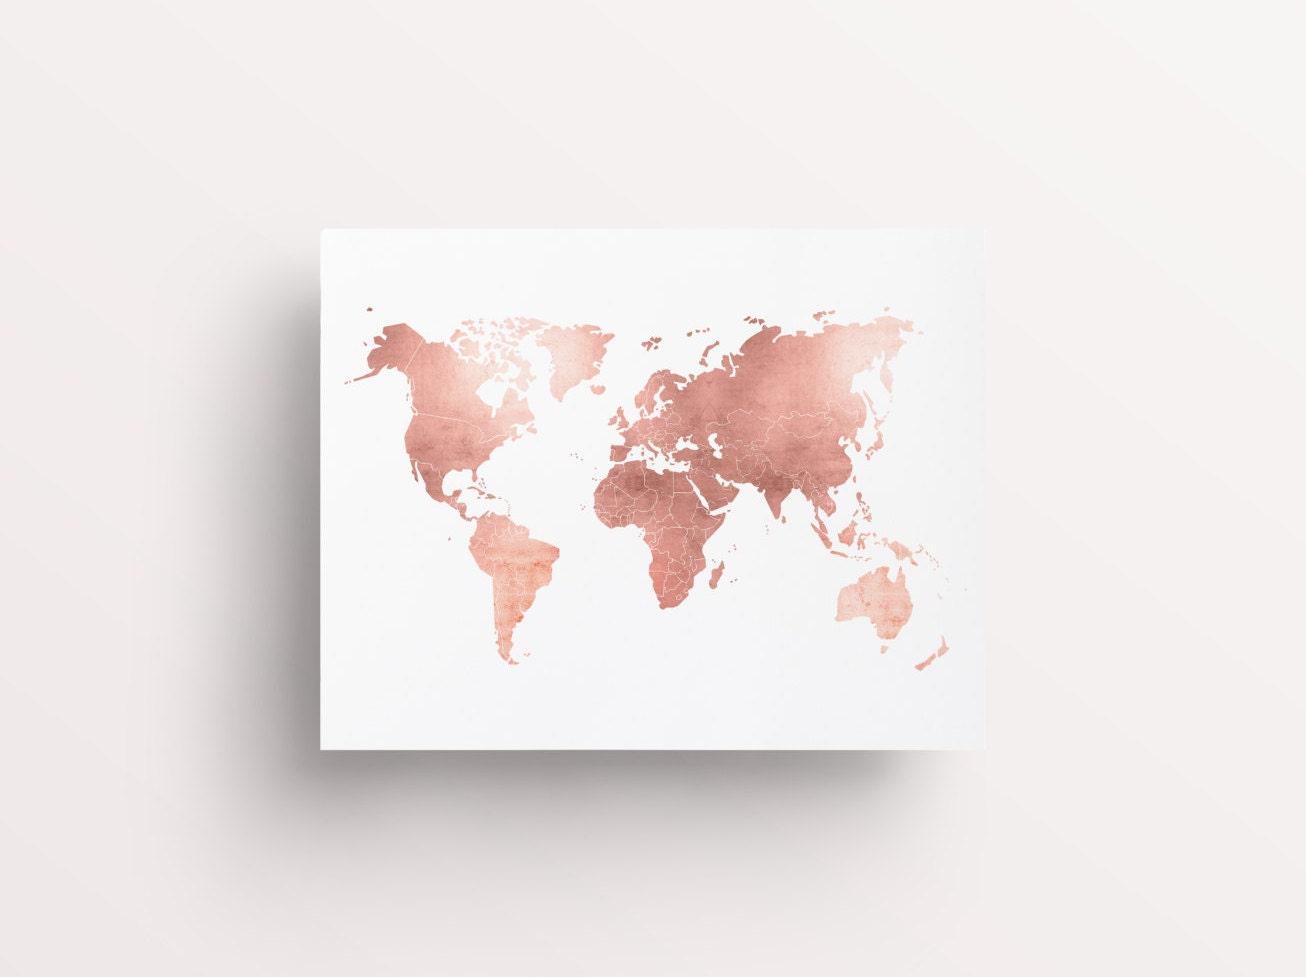 wallpaper world map gold - photo #40